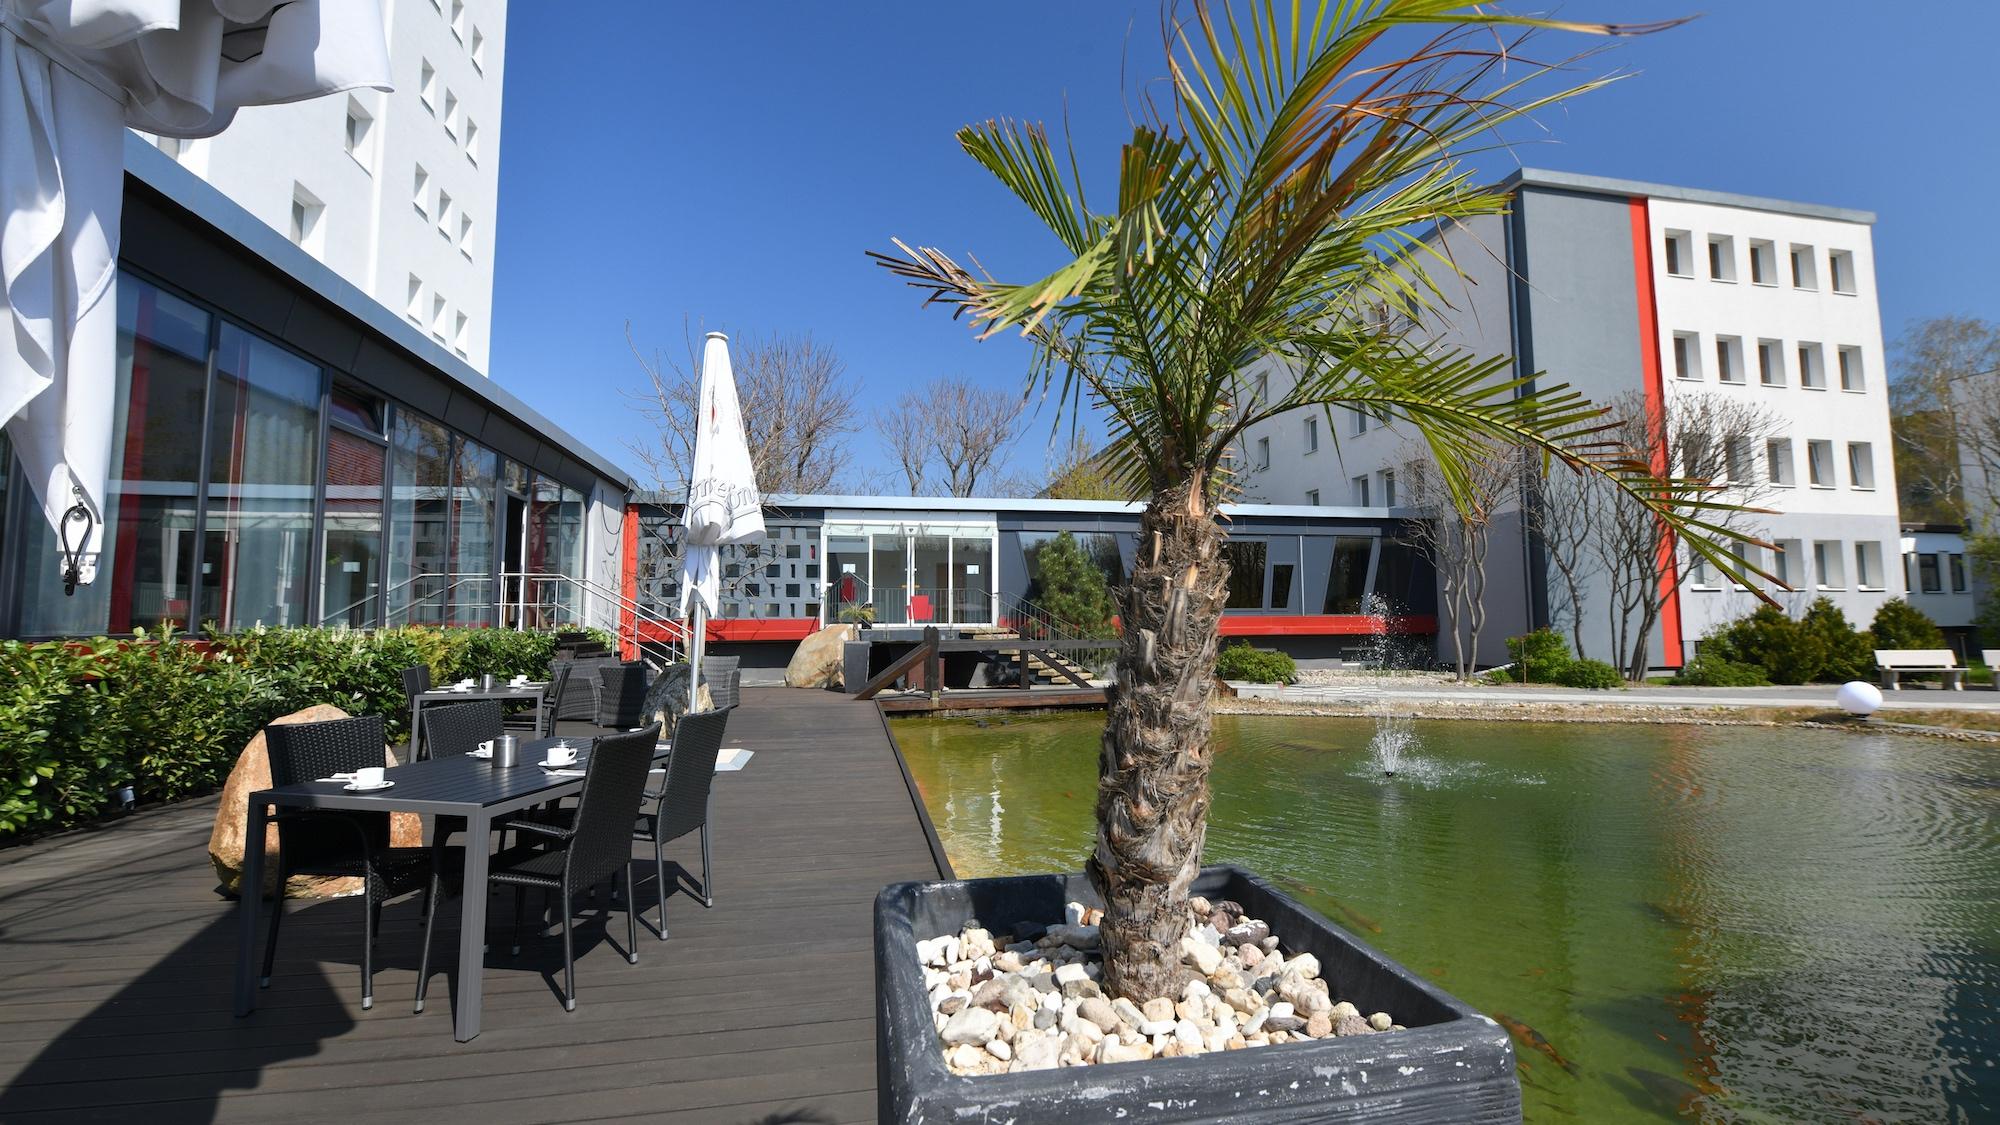 Skyhotel merseburg hostel leuna halle seetarrasse